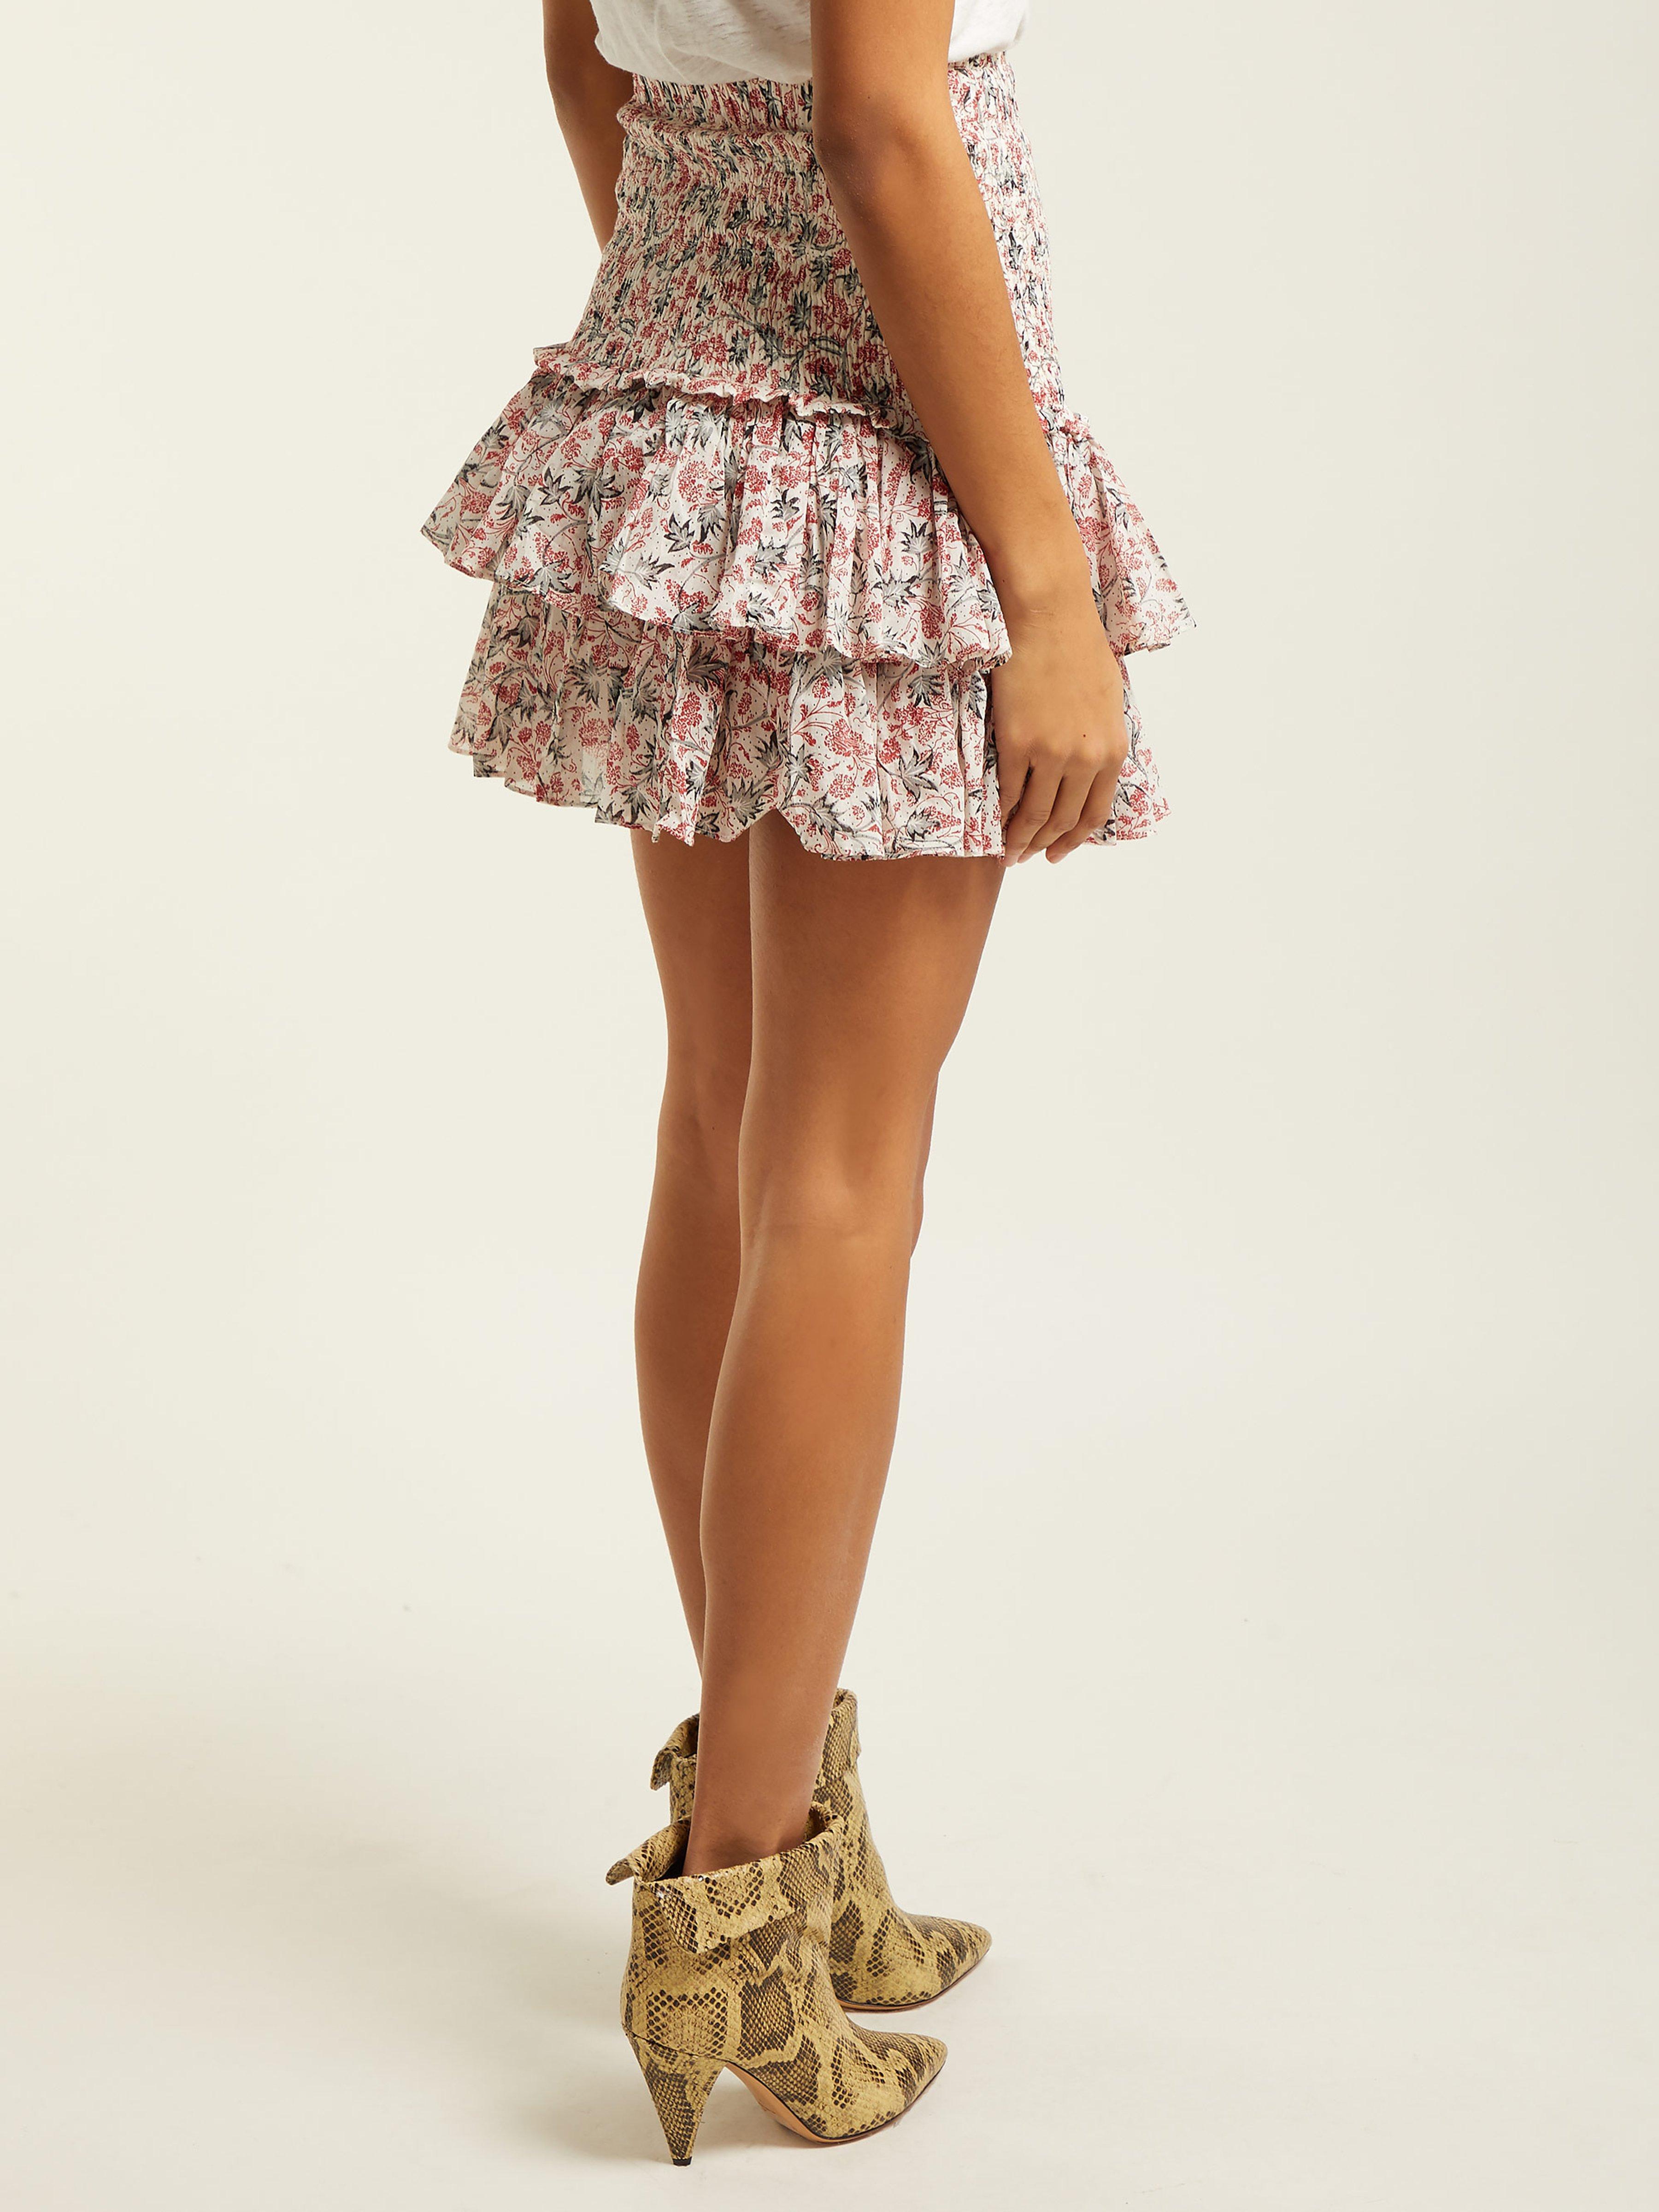 c144763d95d79 Étoile Isabel Marant Naomi Floral Print Cotton Mini Skirt - Lyst